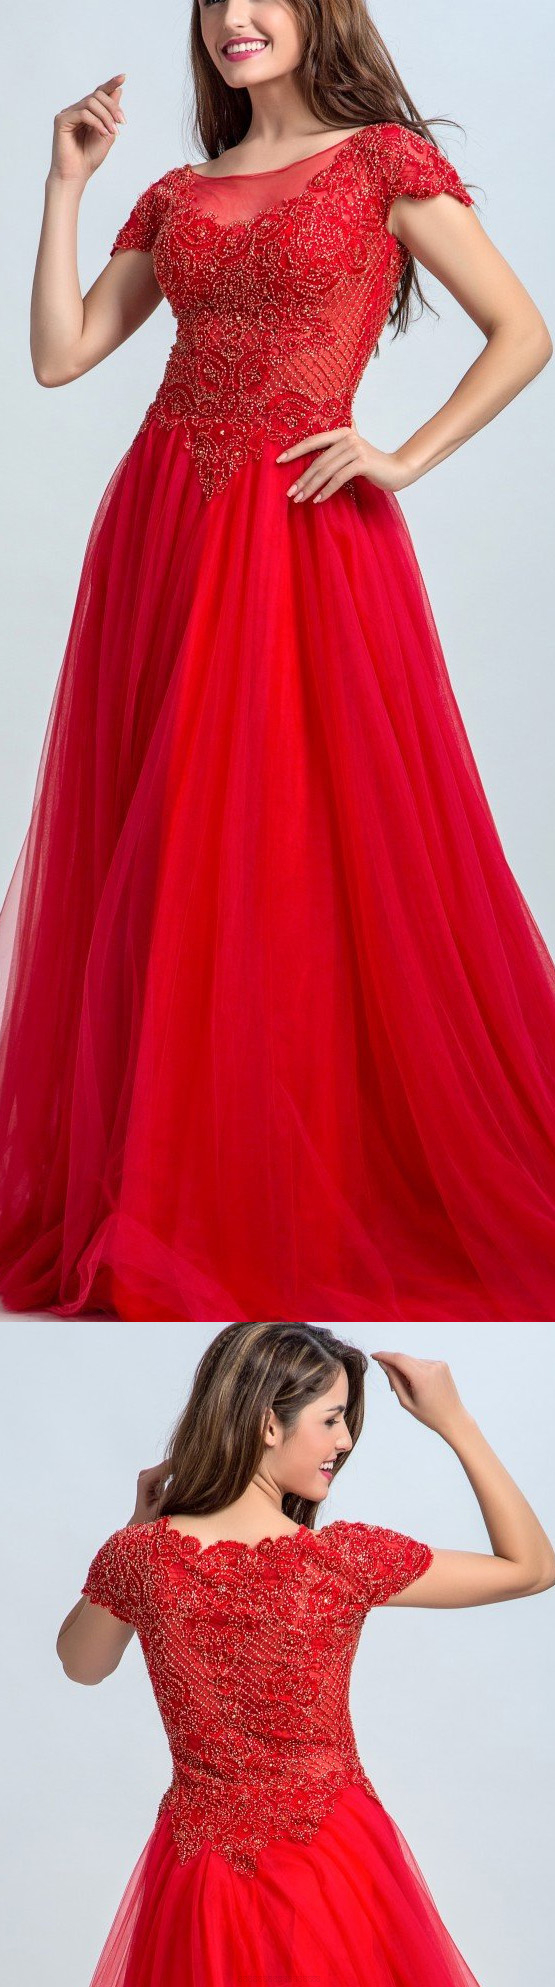 Bateau Evening Dresses Red Long Prom Dresses Red Color Aline